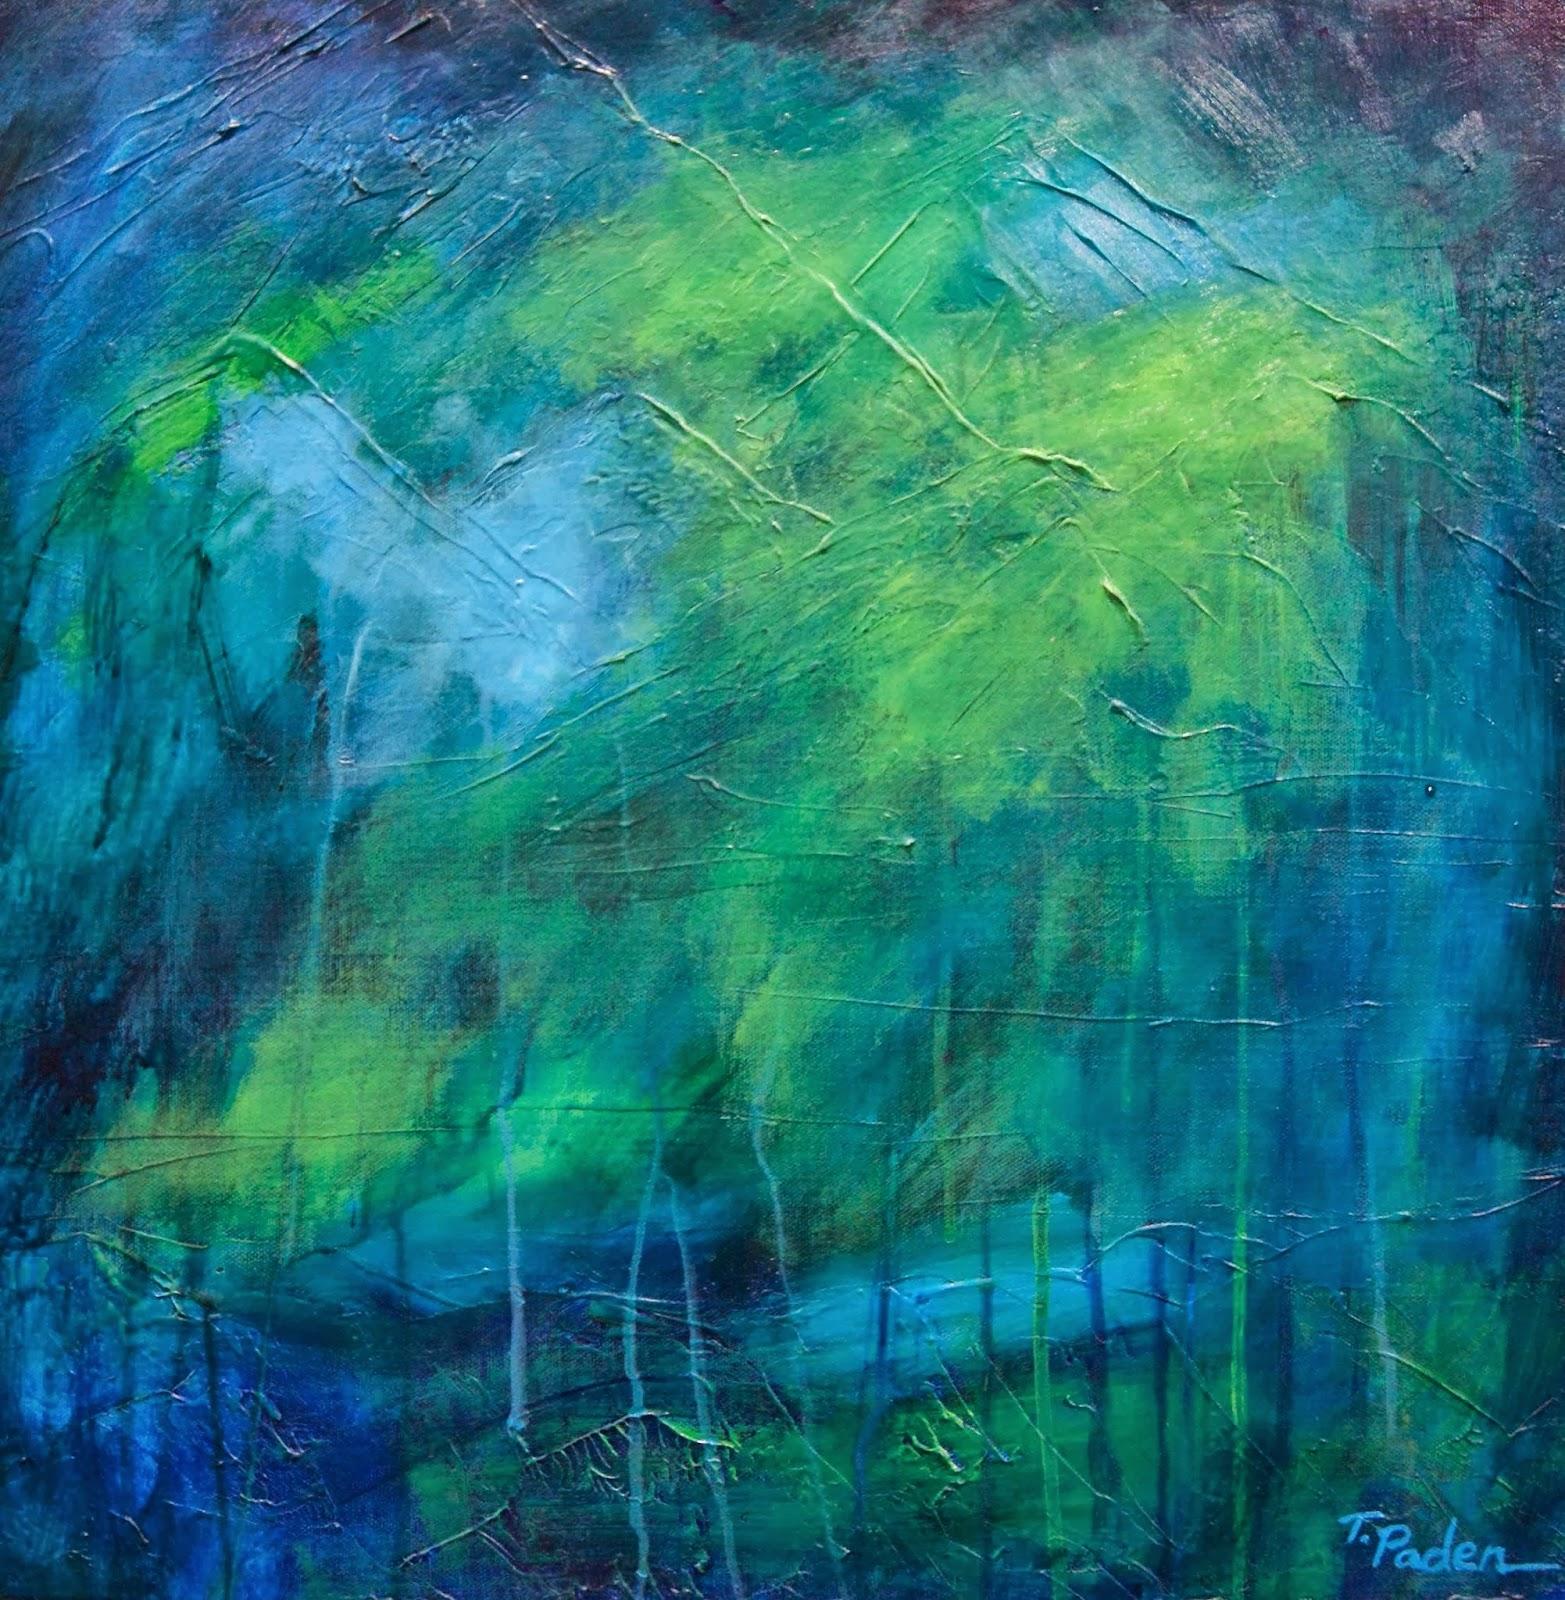 Blue Green Paintings